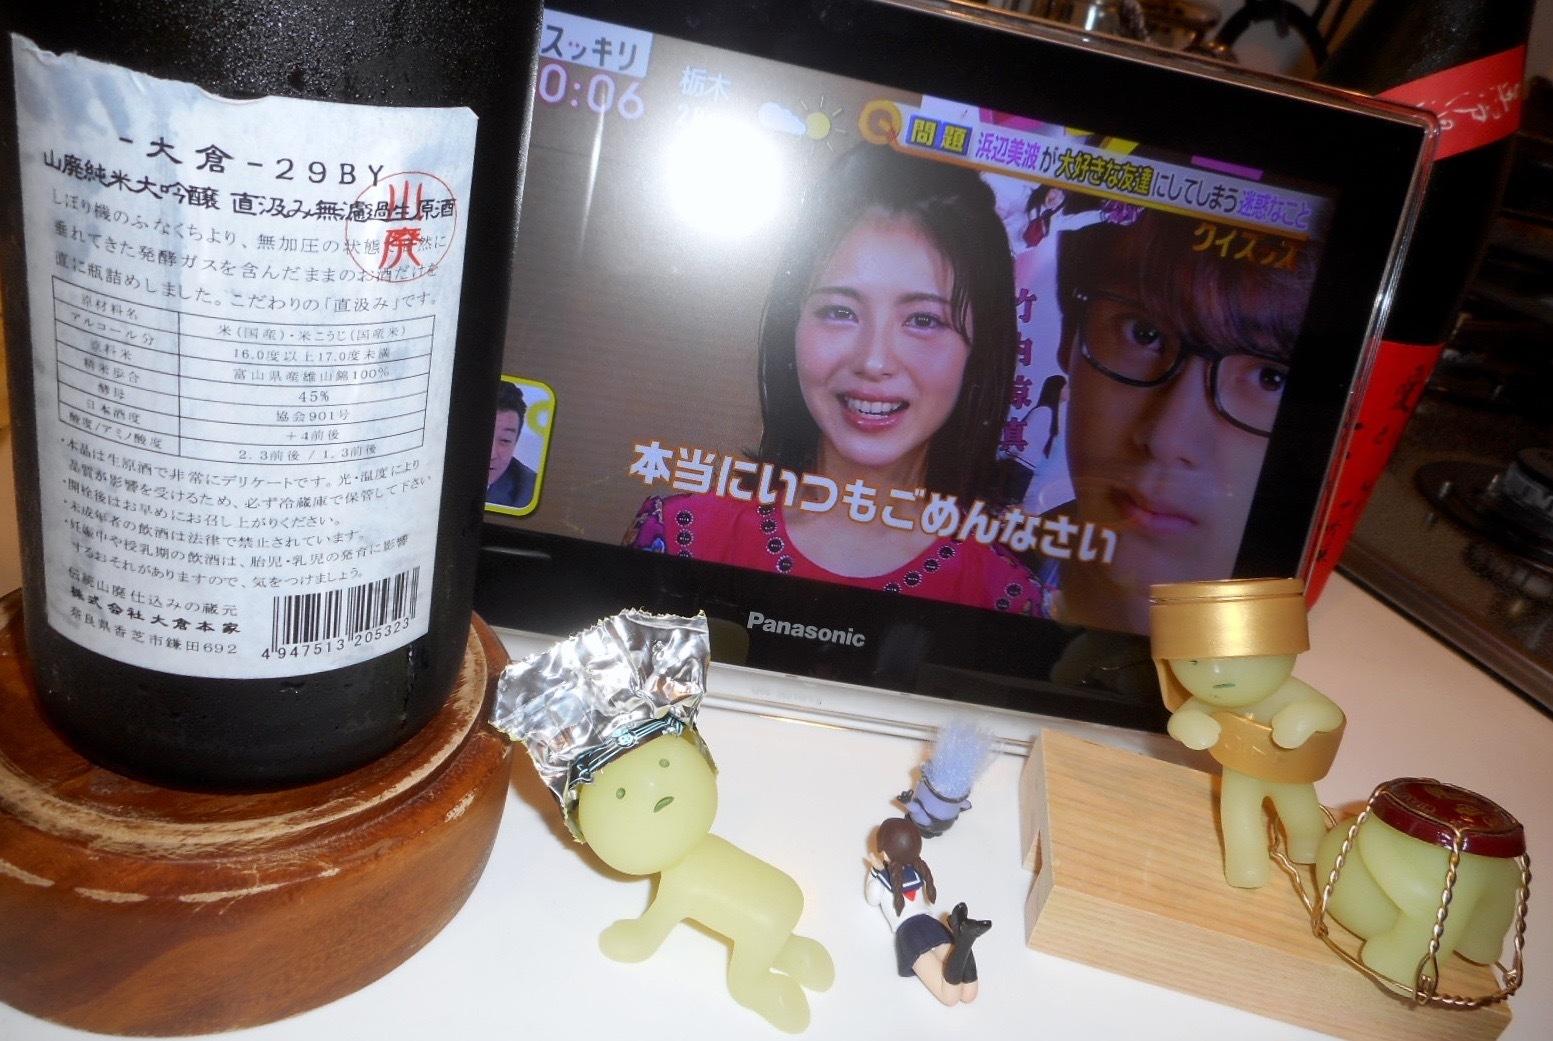 ookura_oyama45_29by2.jpg